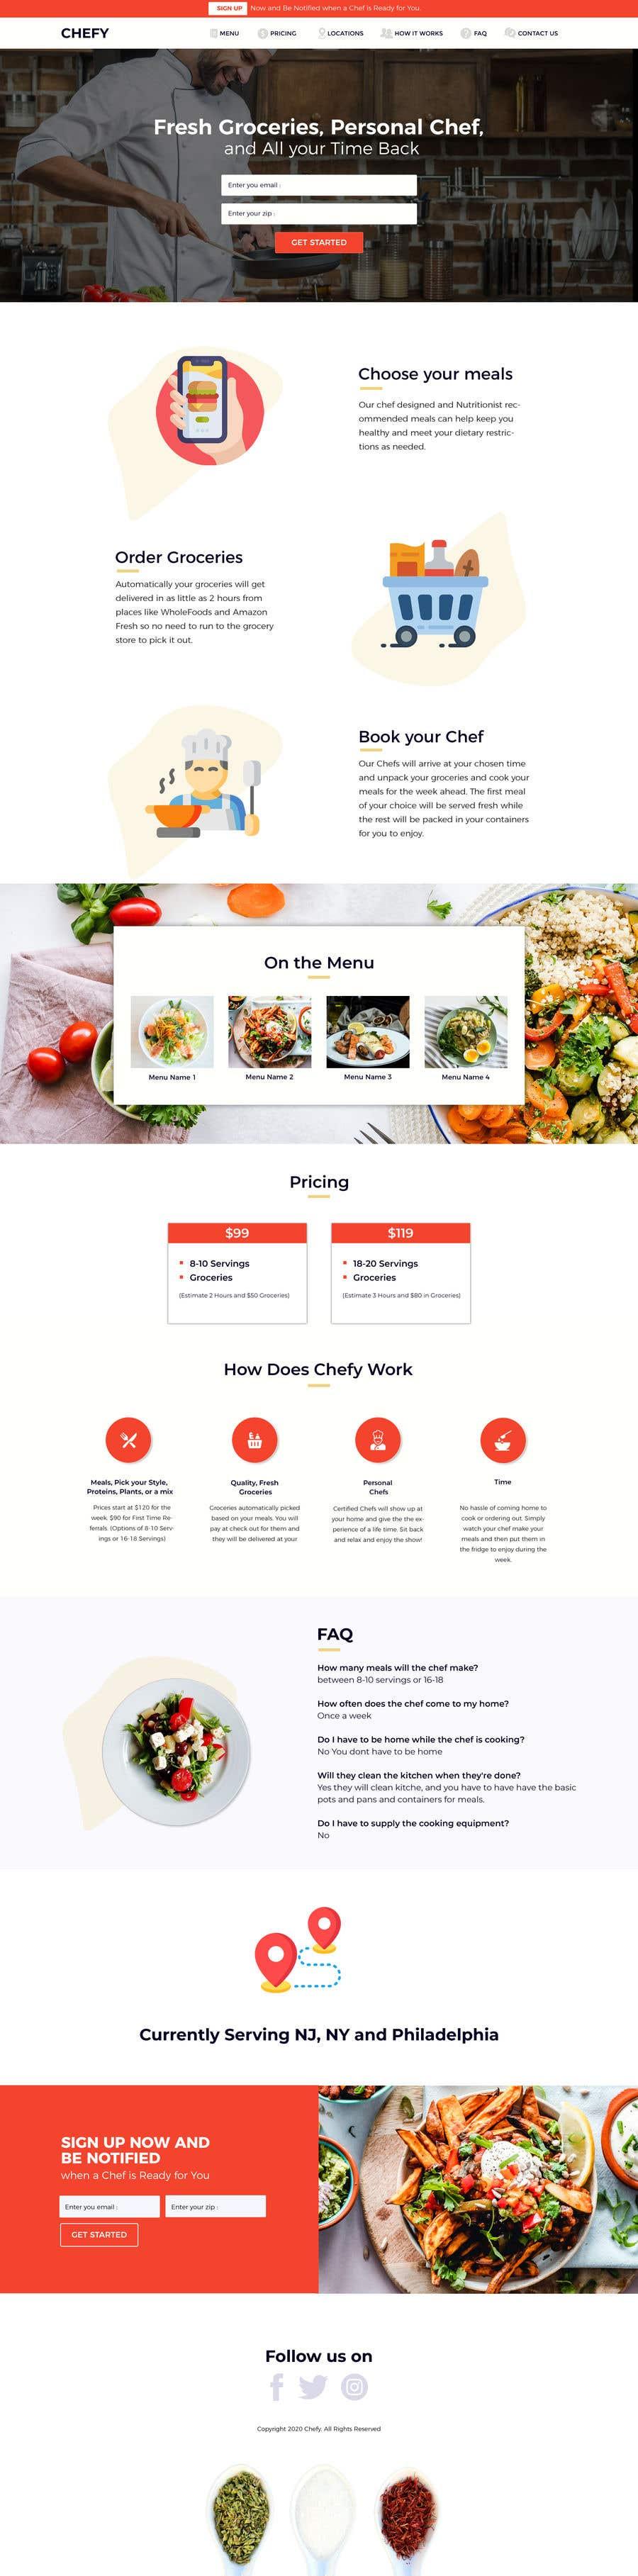 Konkurrenceindlæg #                                        2                                      for                                         Looking for best Website Landing Page Designer for My Product Landing Page